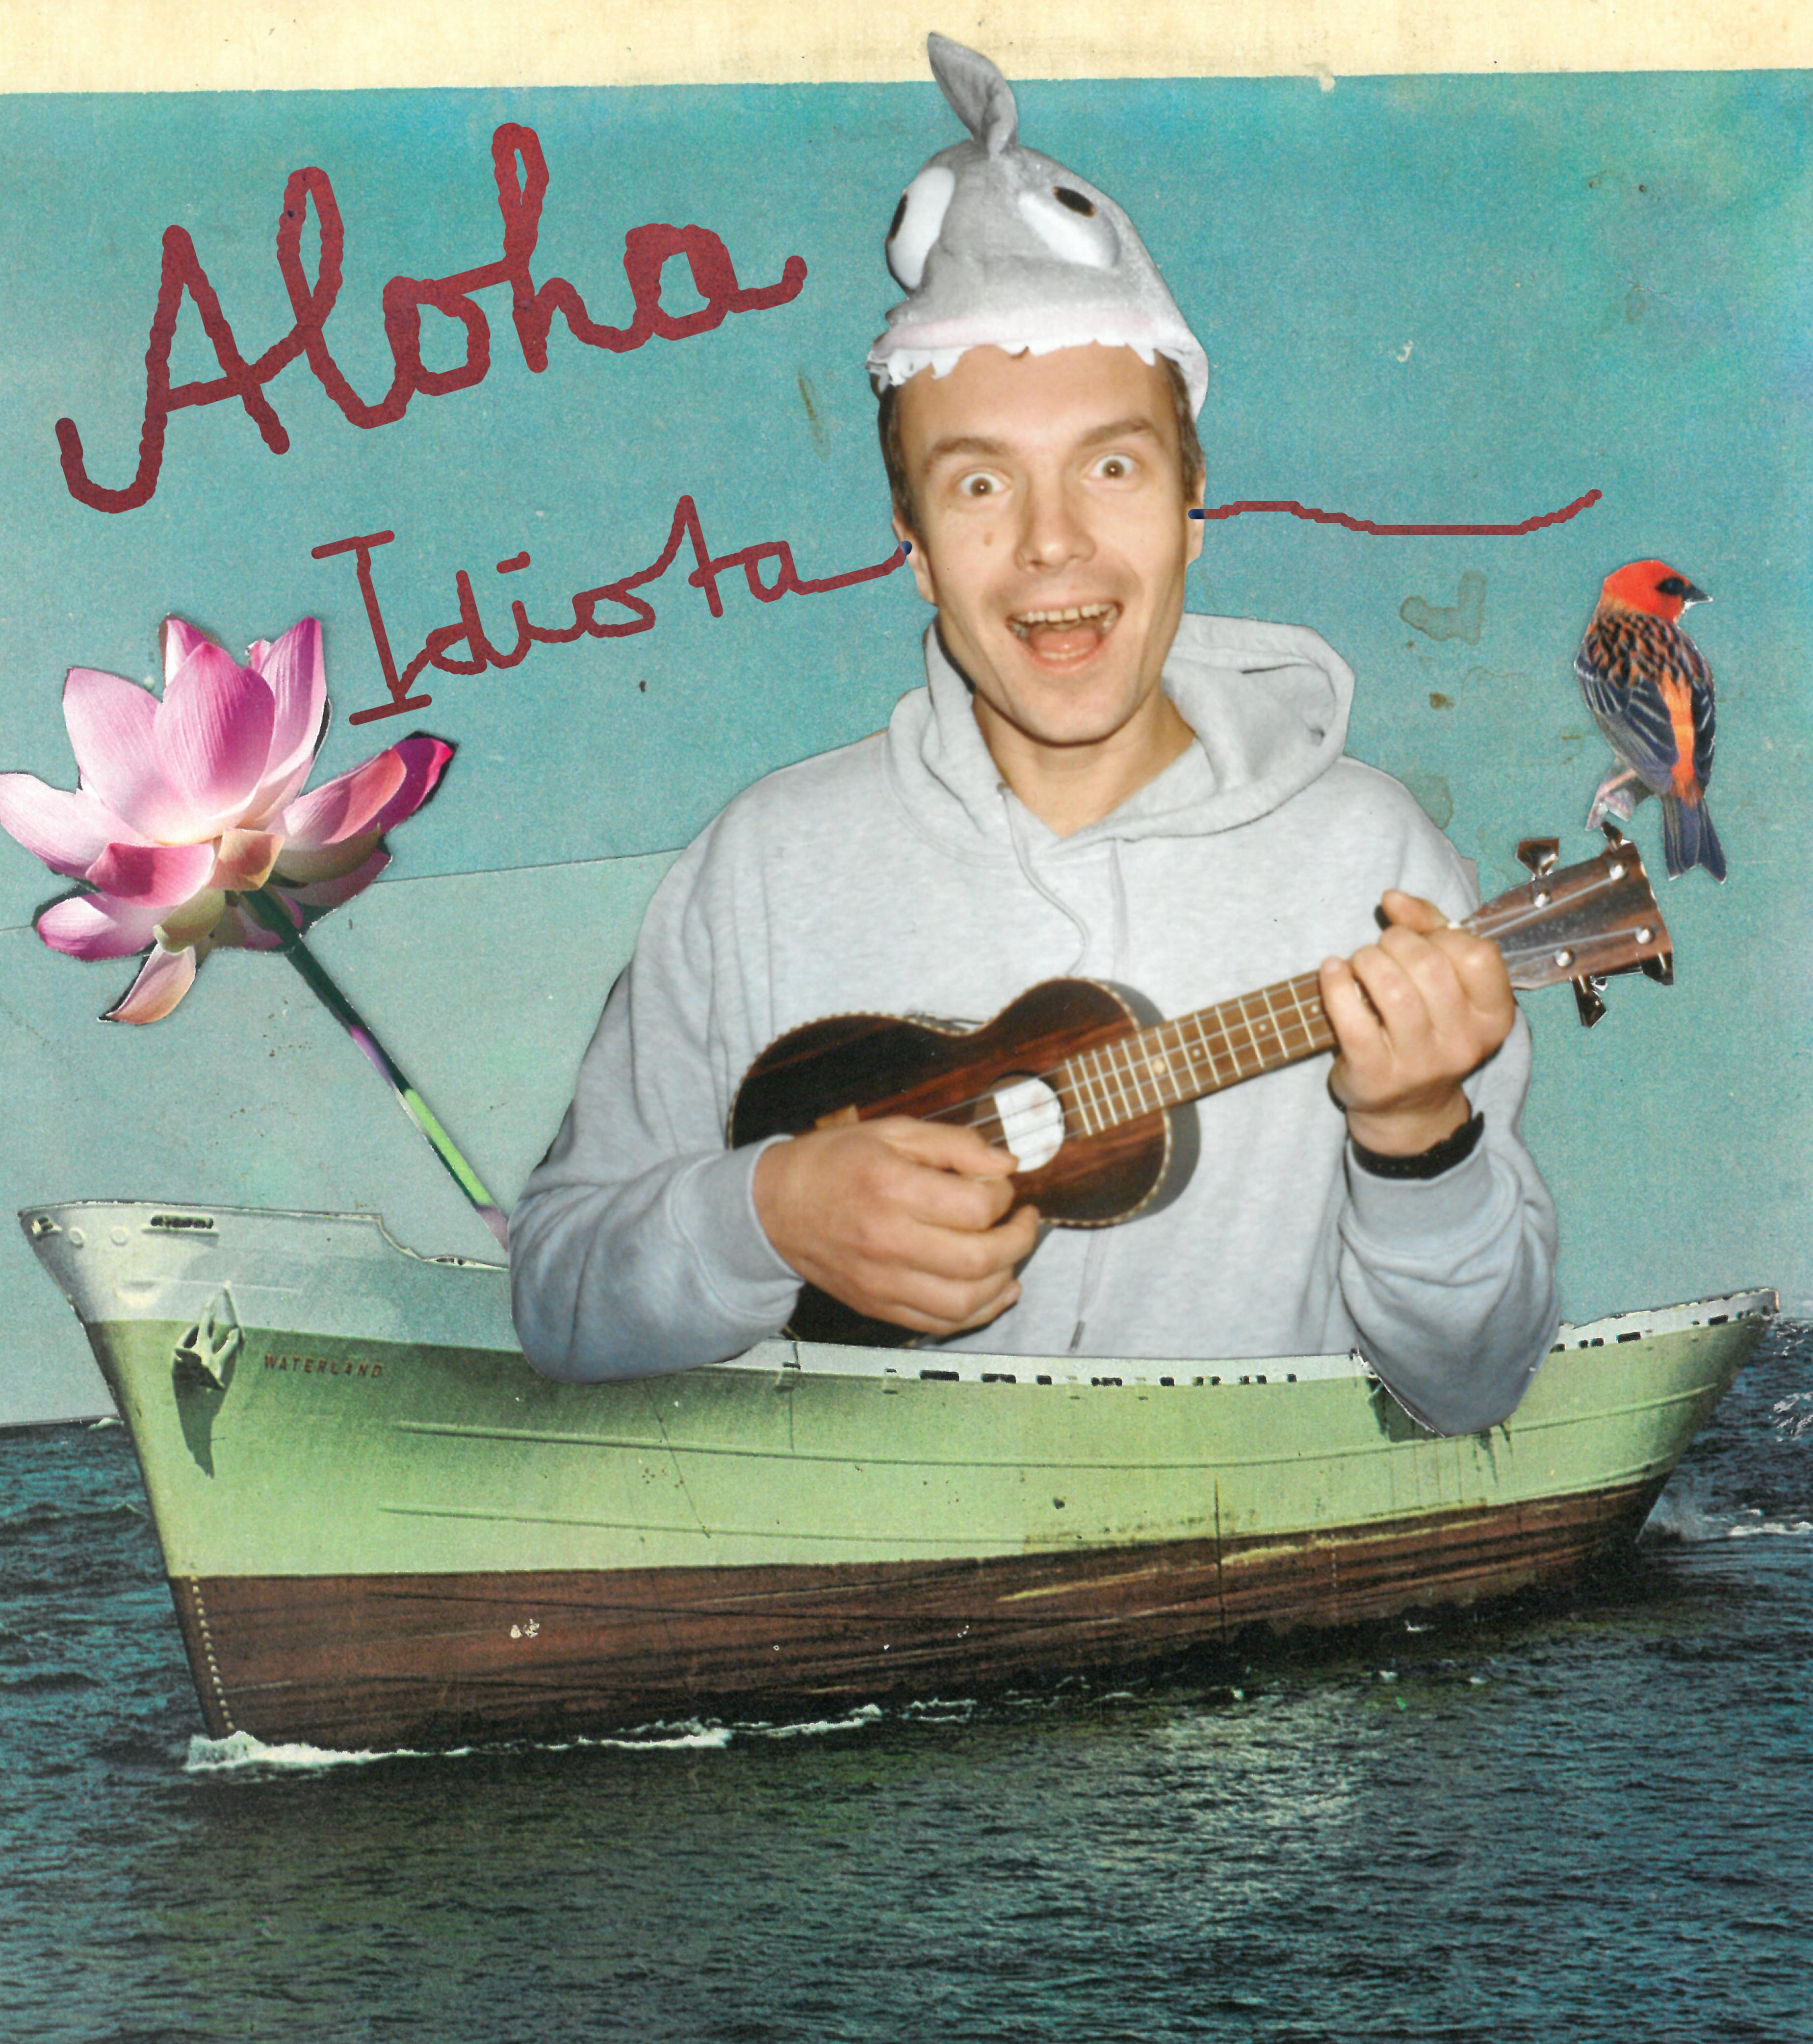 Krautman – Aloha Idiota